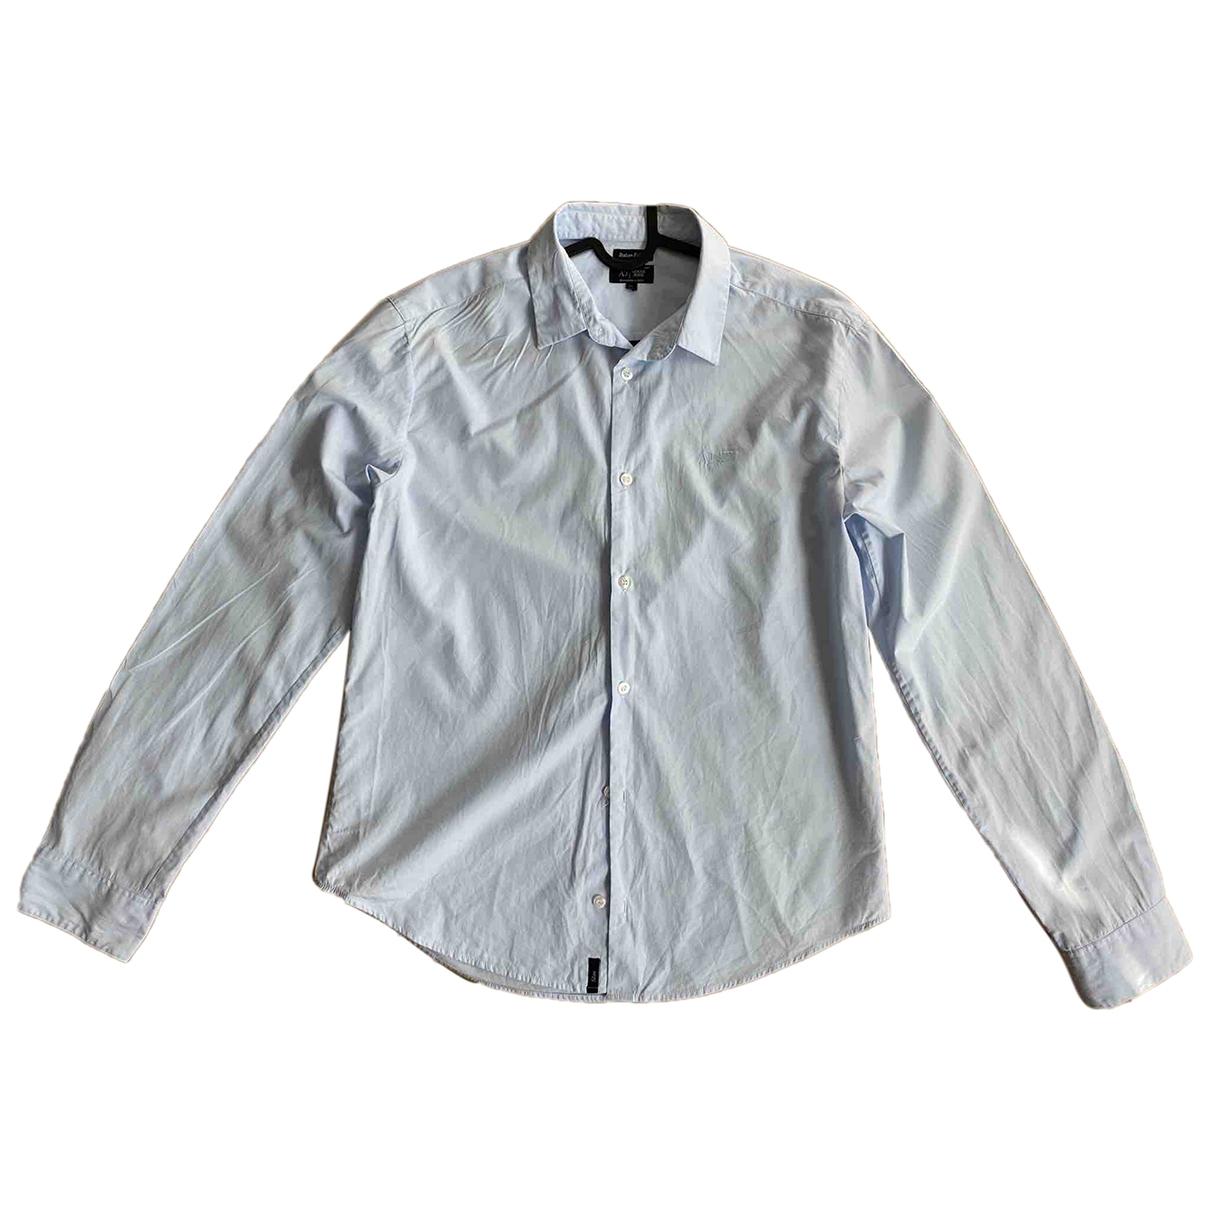 Armani Jeans \N Cotton Shirts for Men XL International